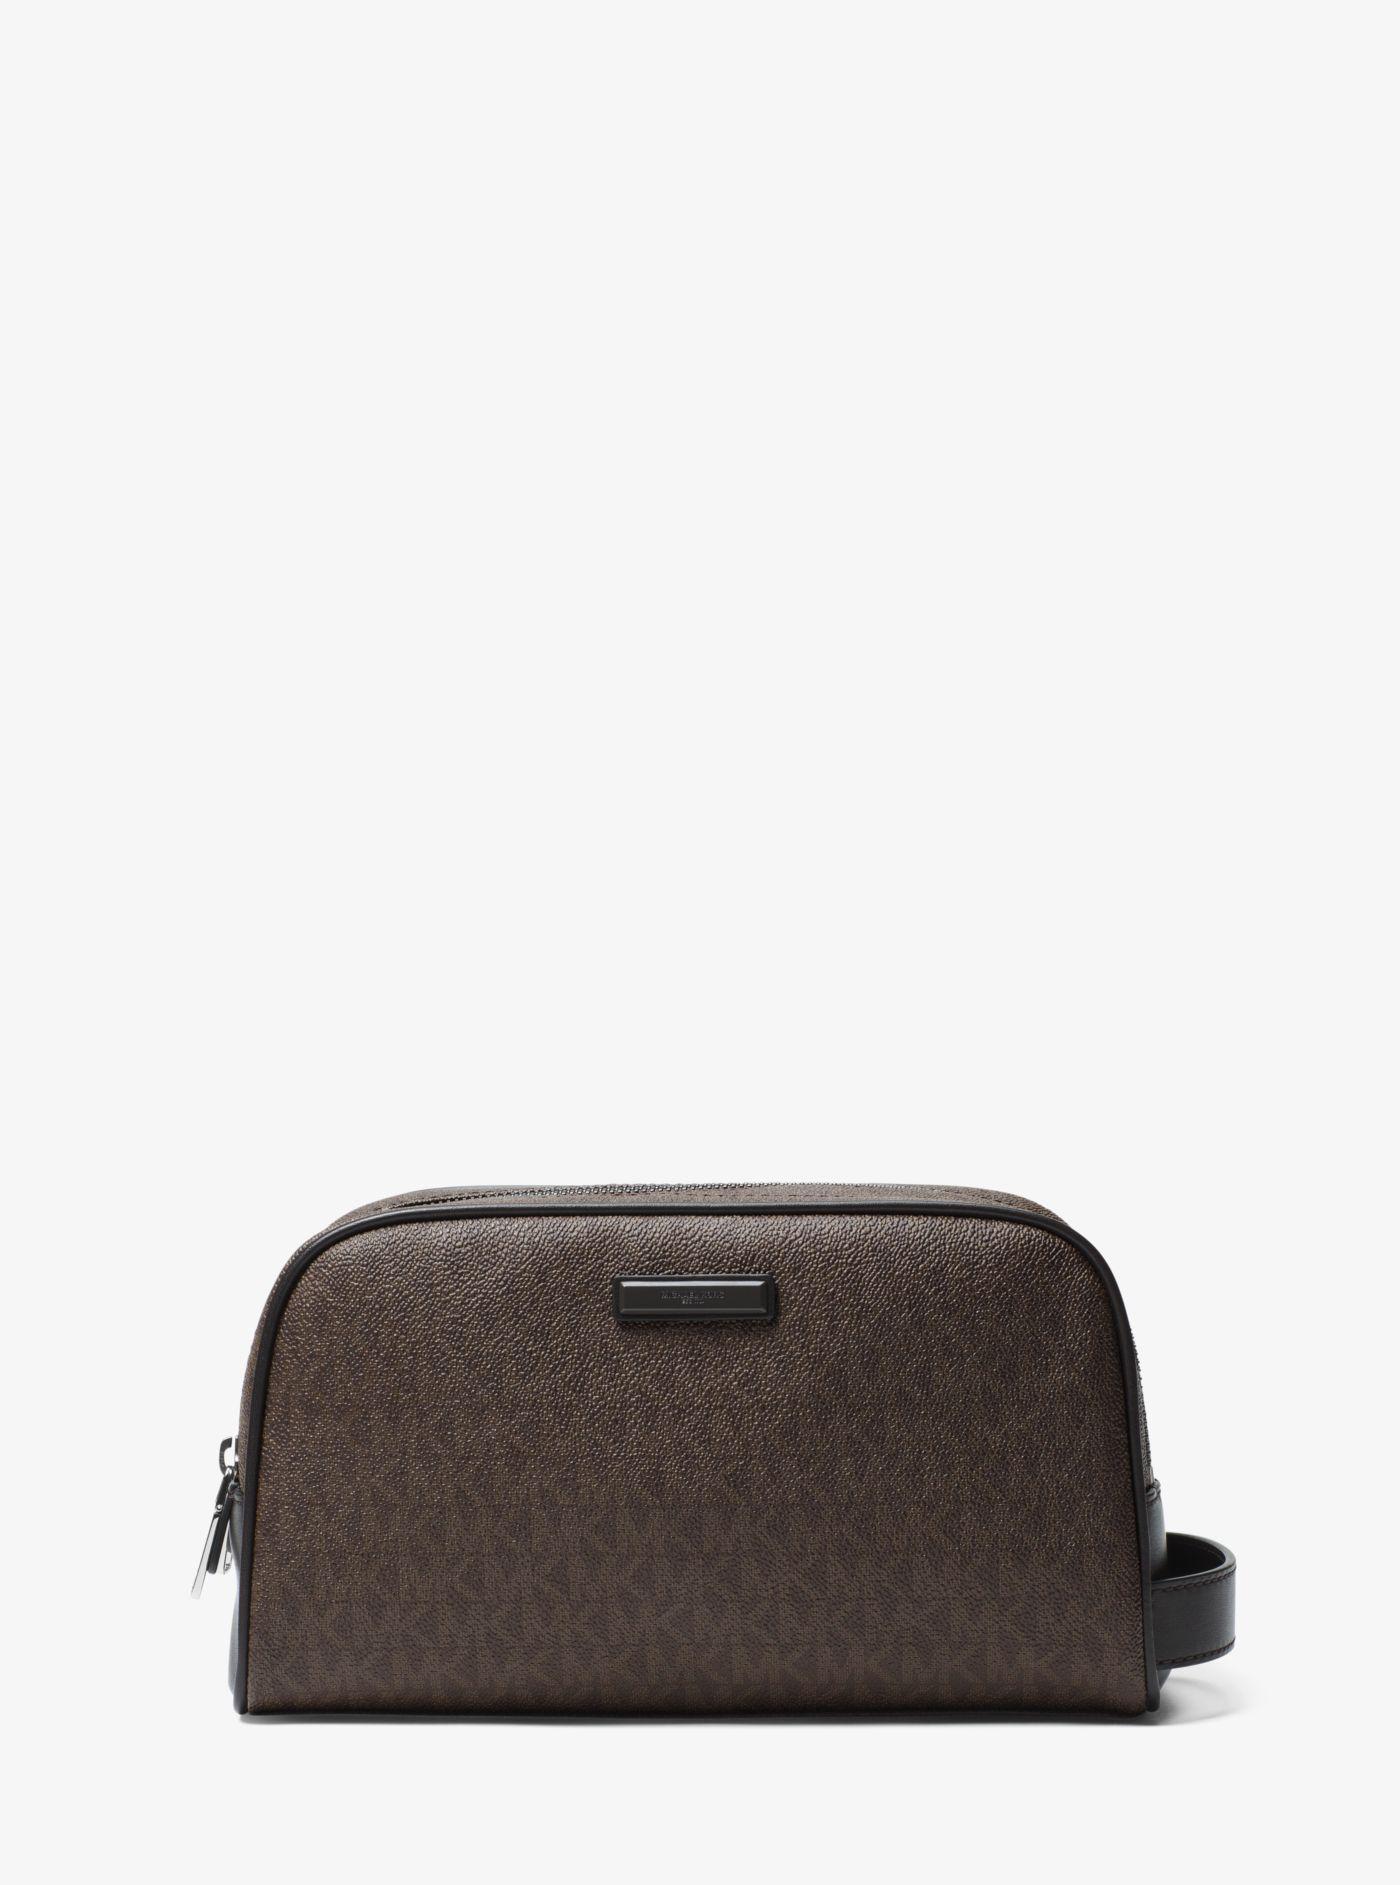 e278a3bad42e Lyst - Michael Kors Jet Set Logo Double-zip Travel Case in Brown for Men